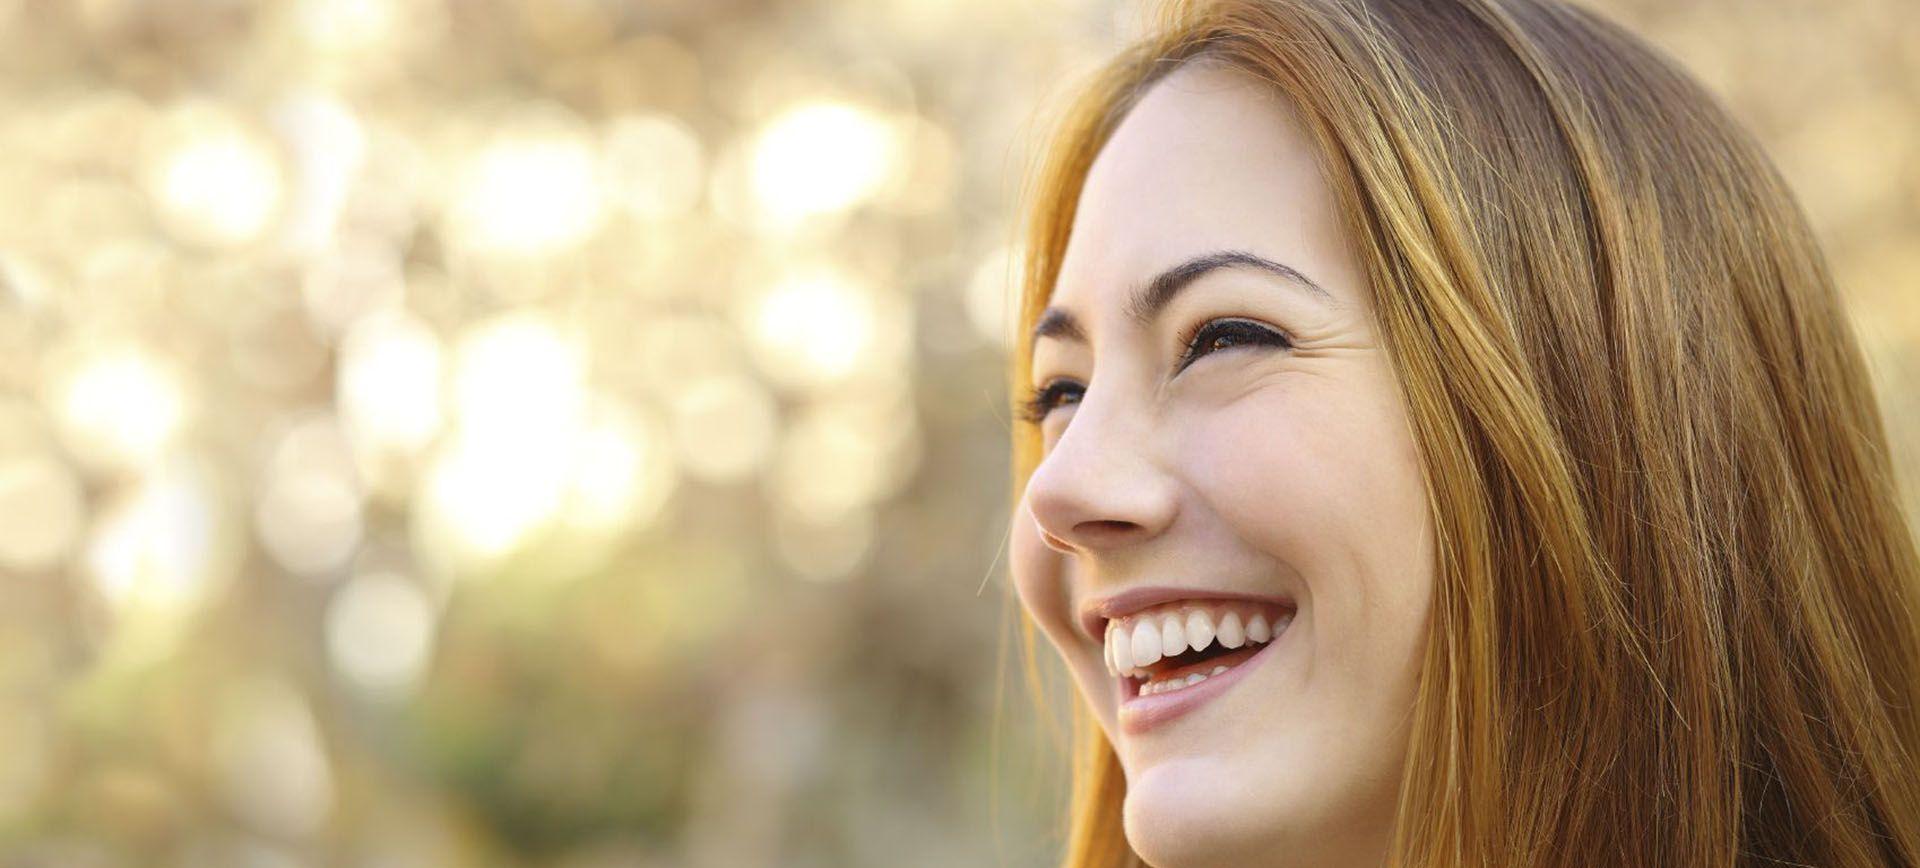 dr alex martinez sonrisa perfecta